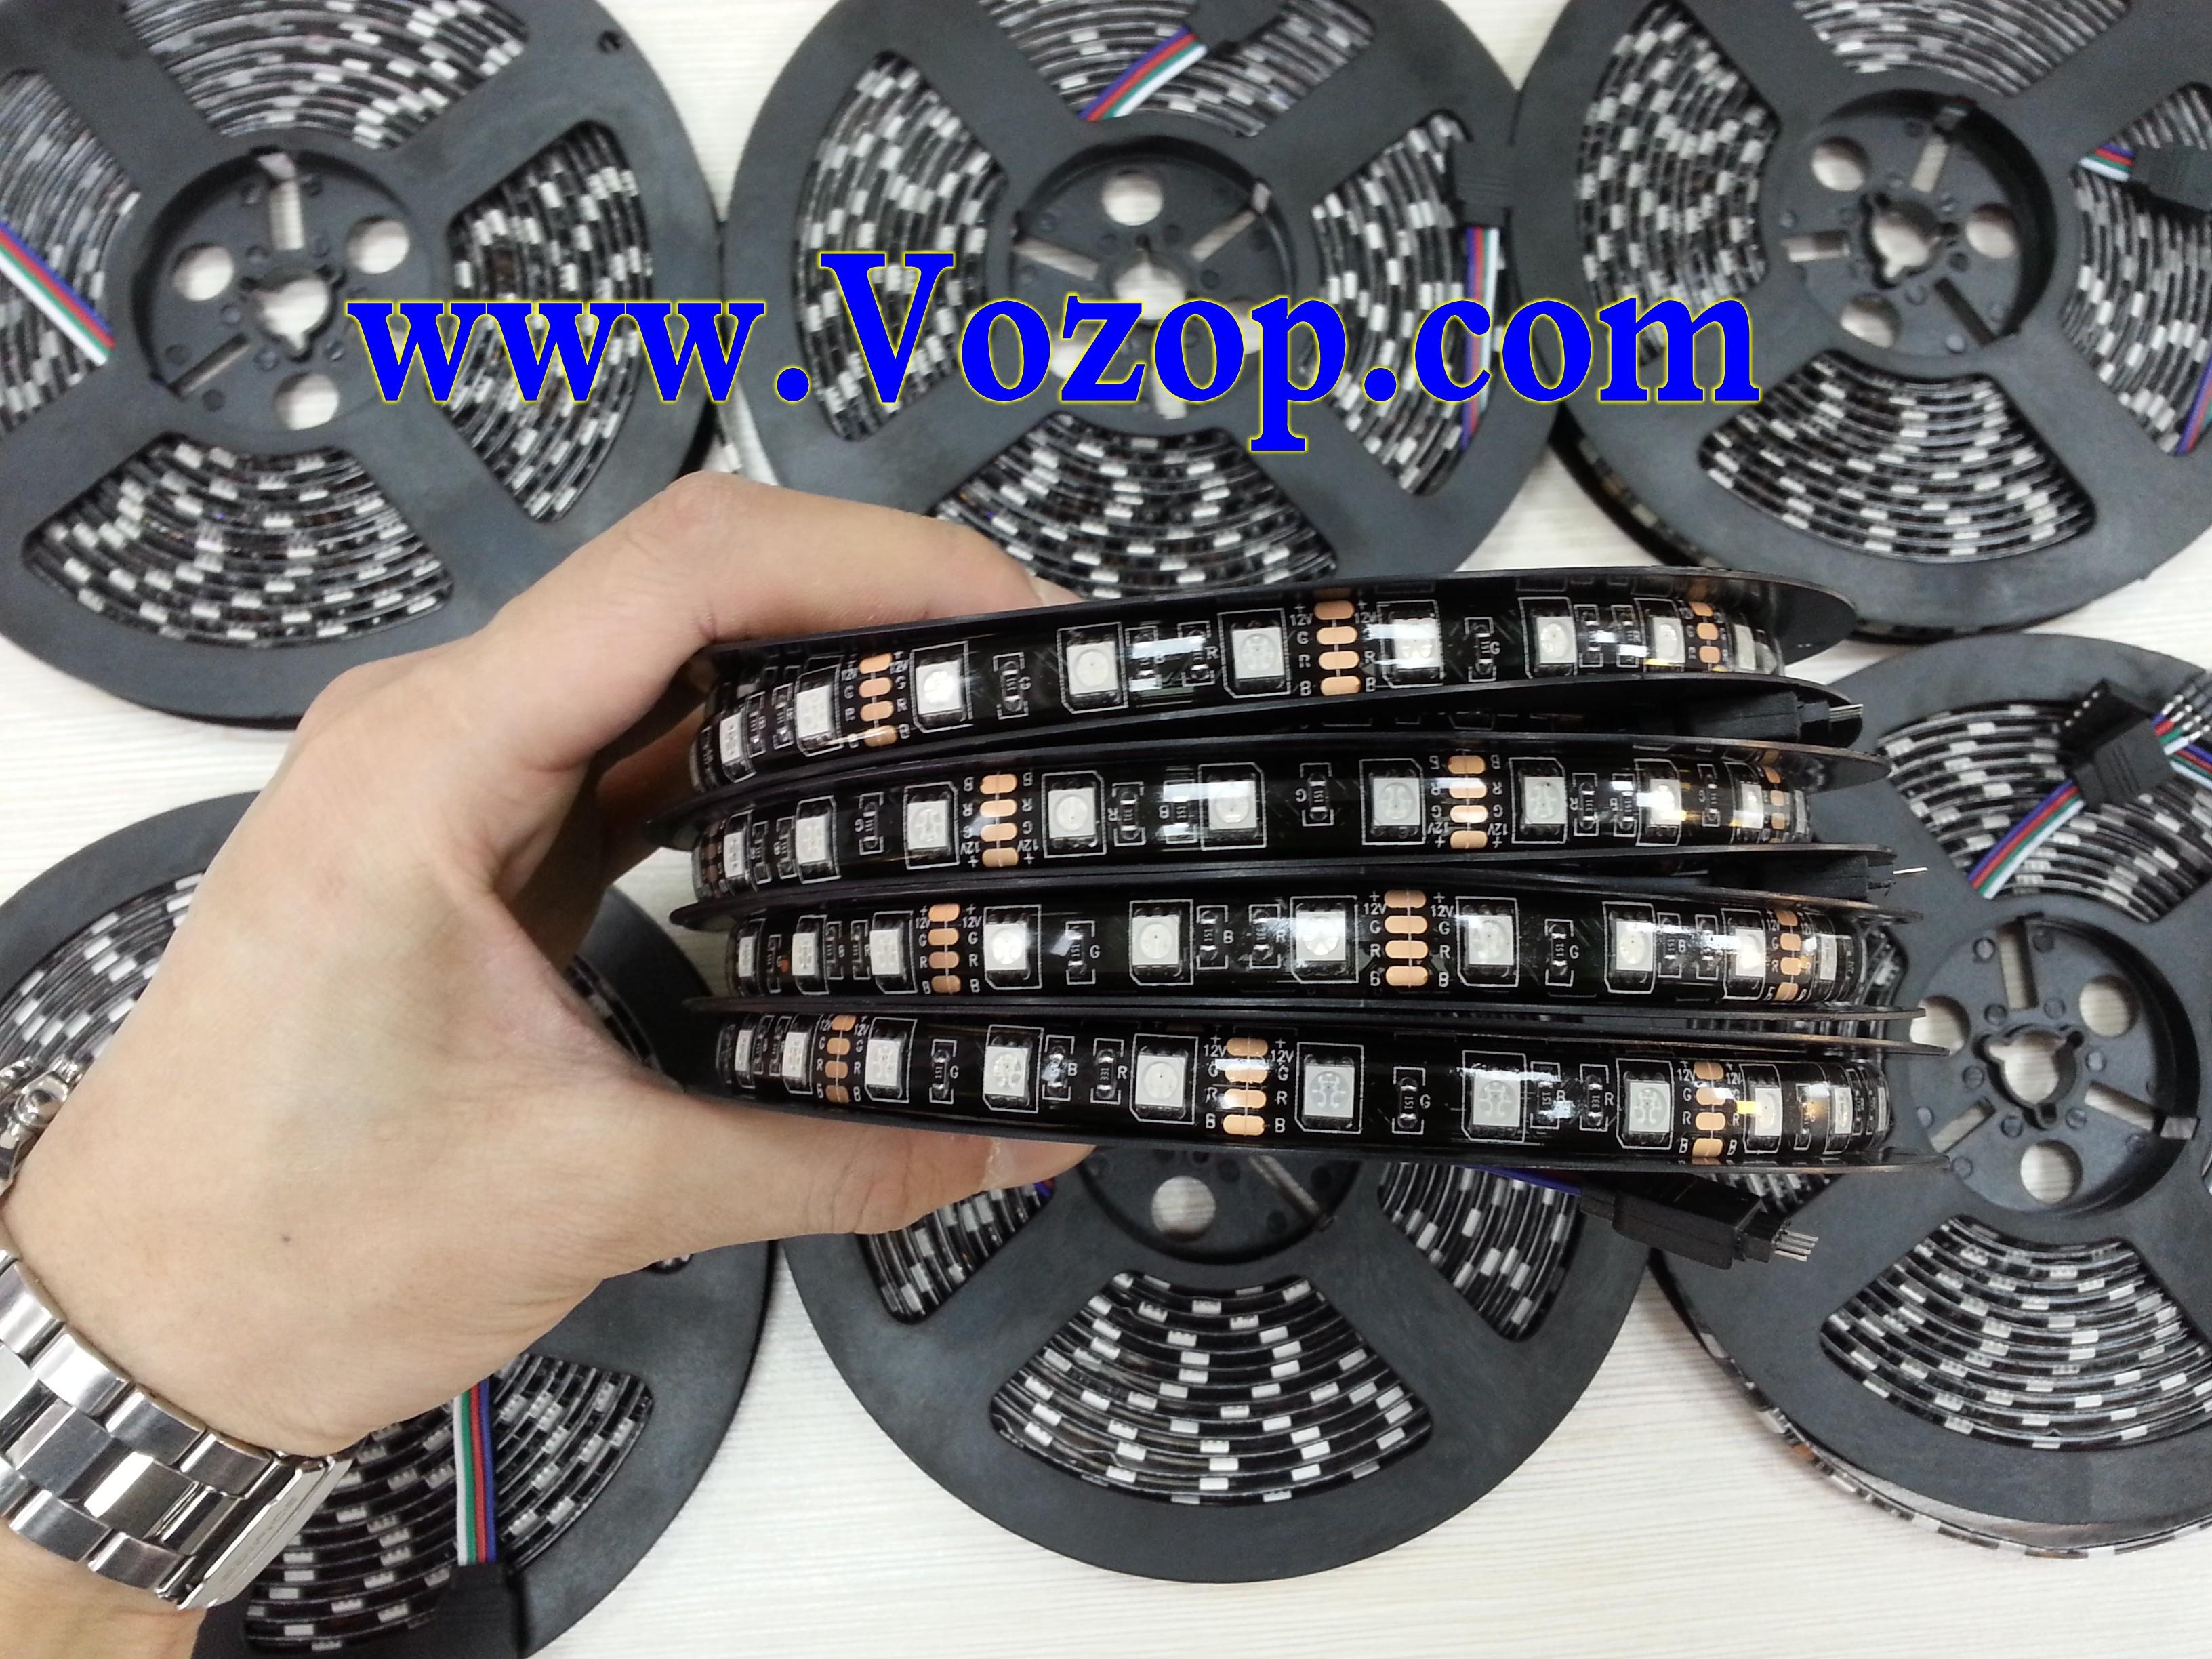 Black_PCB_5050_RGB_Waterproof_LED_Strip_Flexible_Flash_light